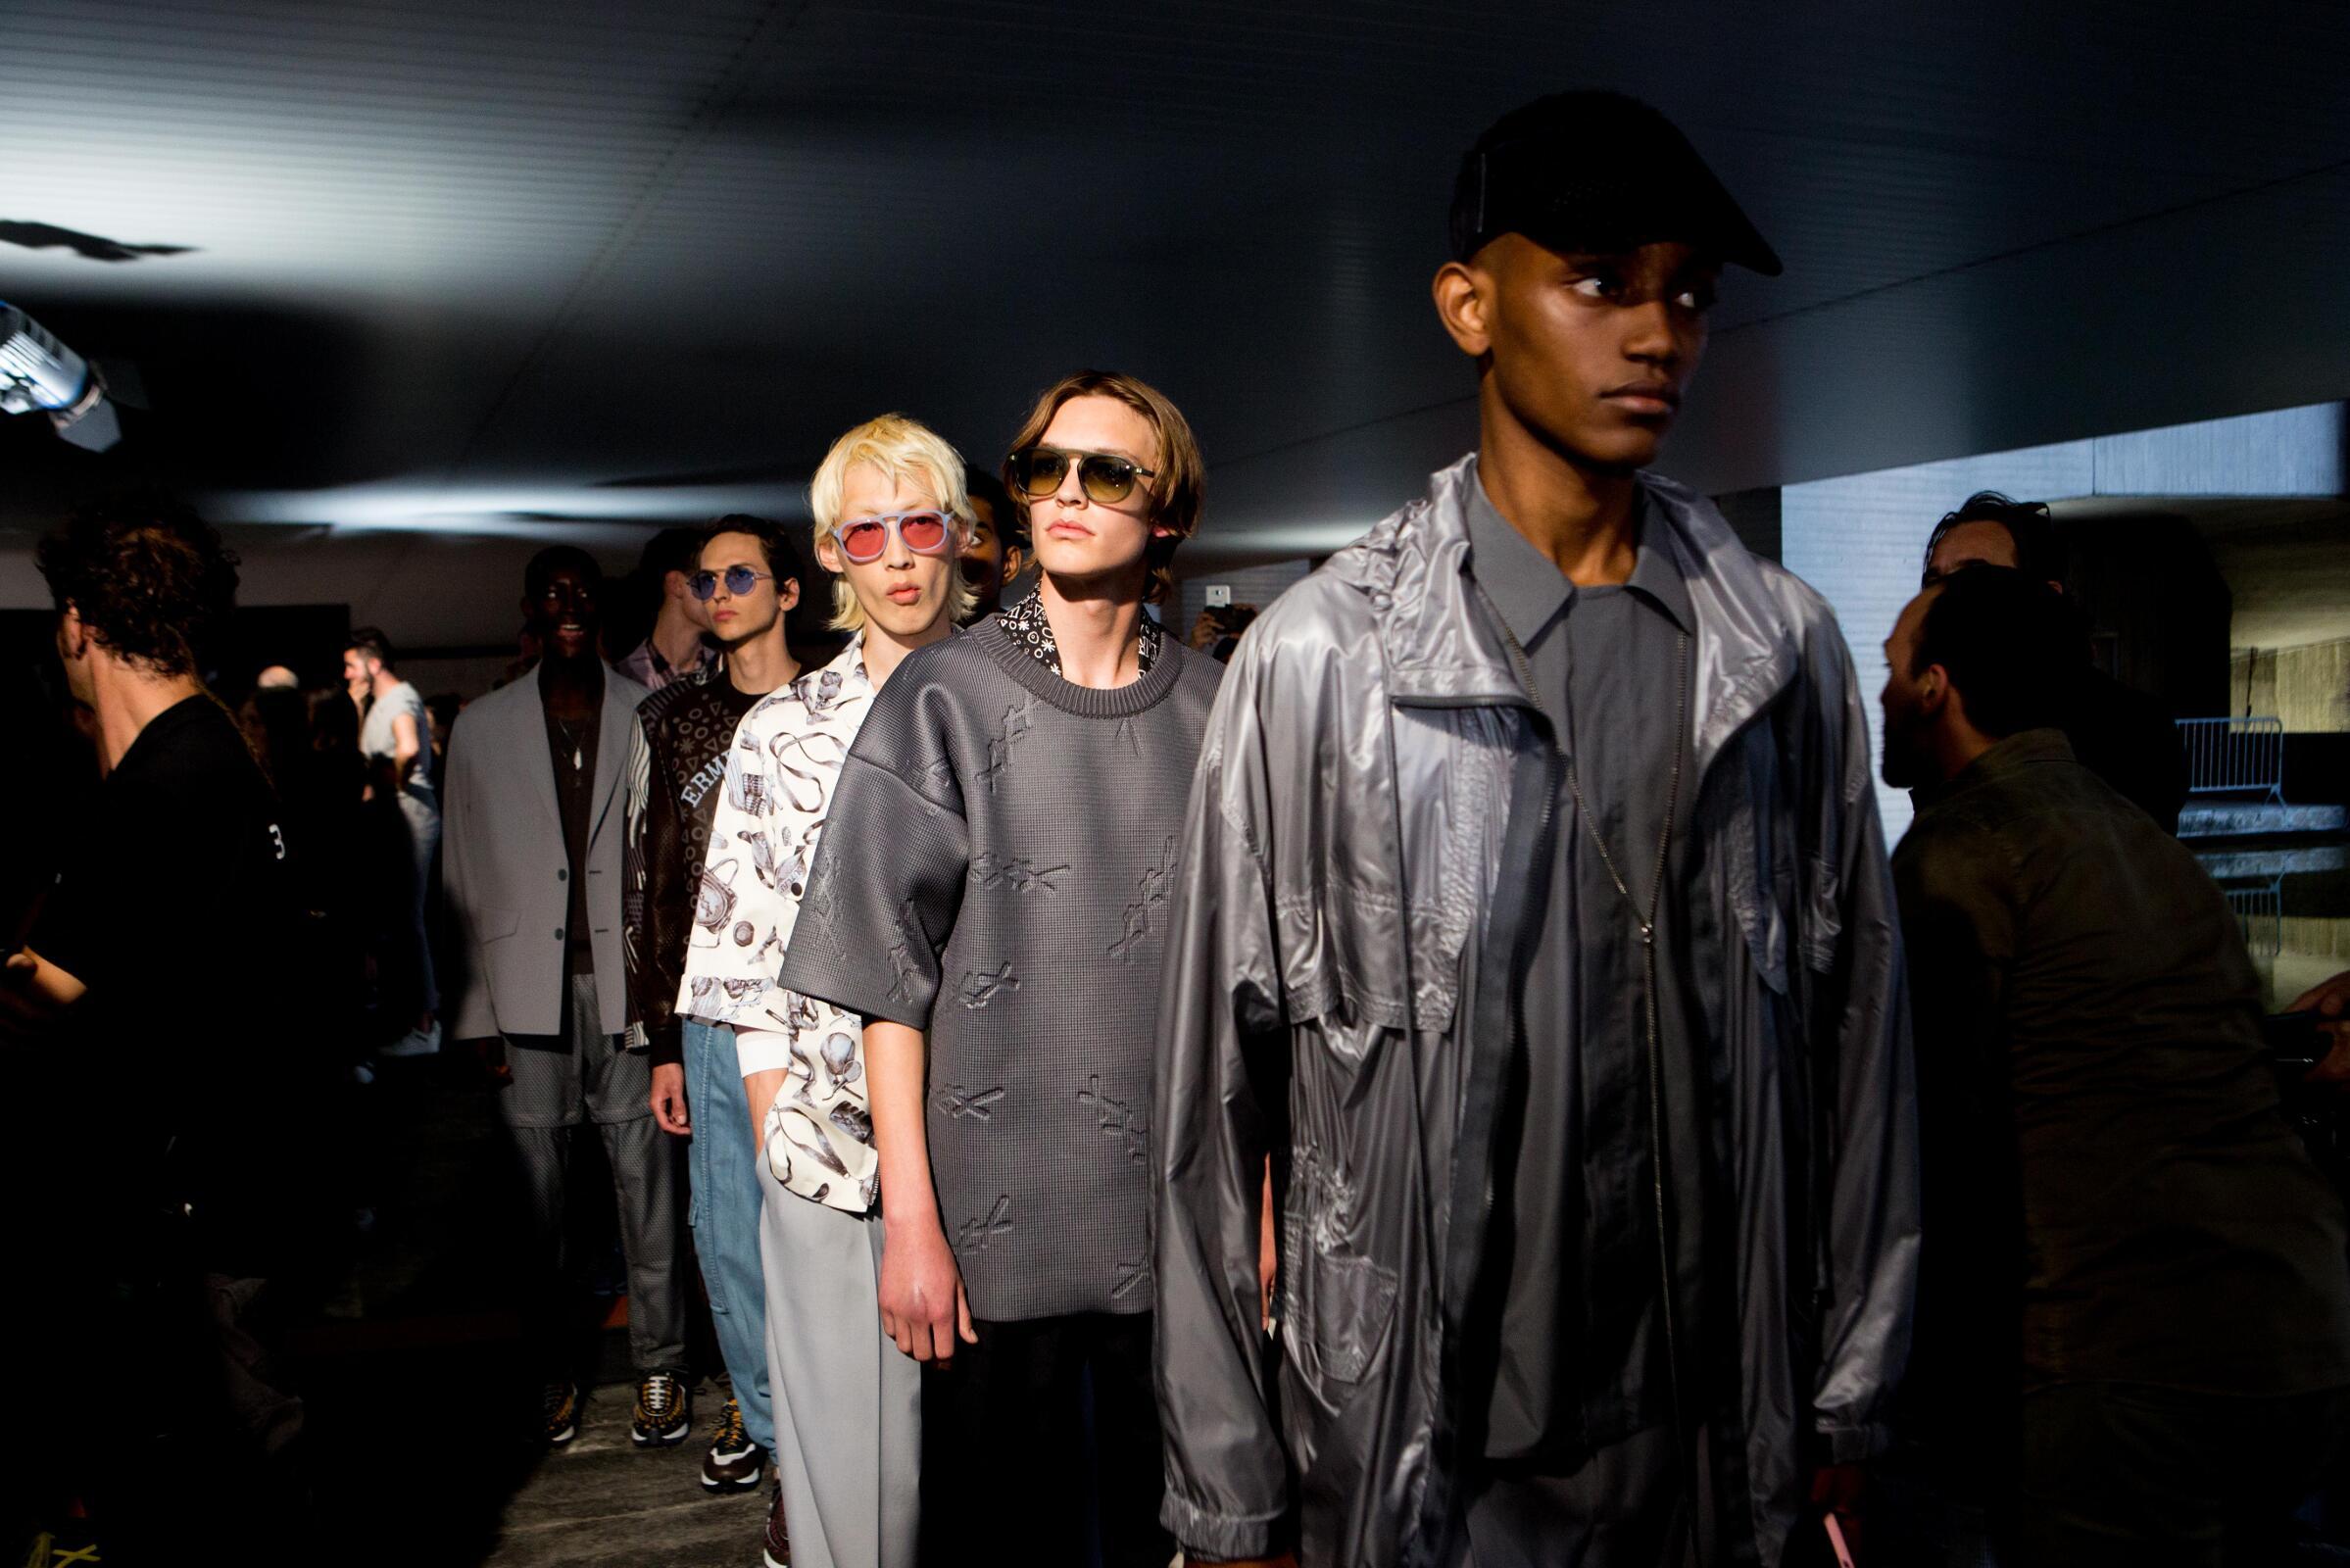 Backstage Ermenegildo Zegna Couture Milan Fashion Week Models